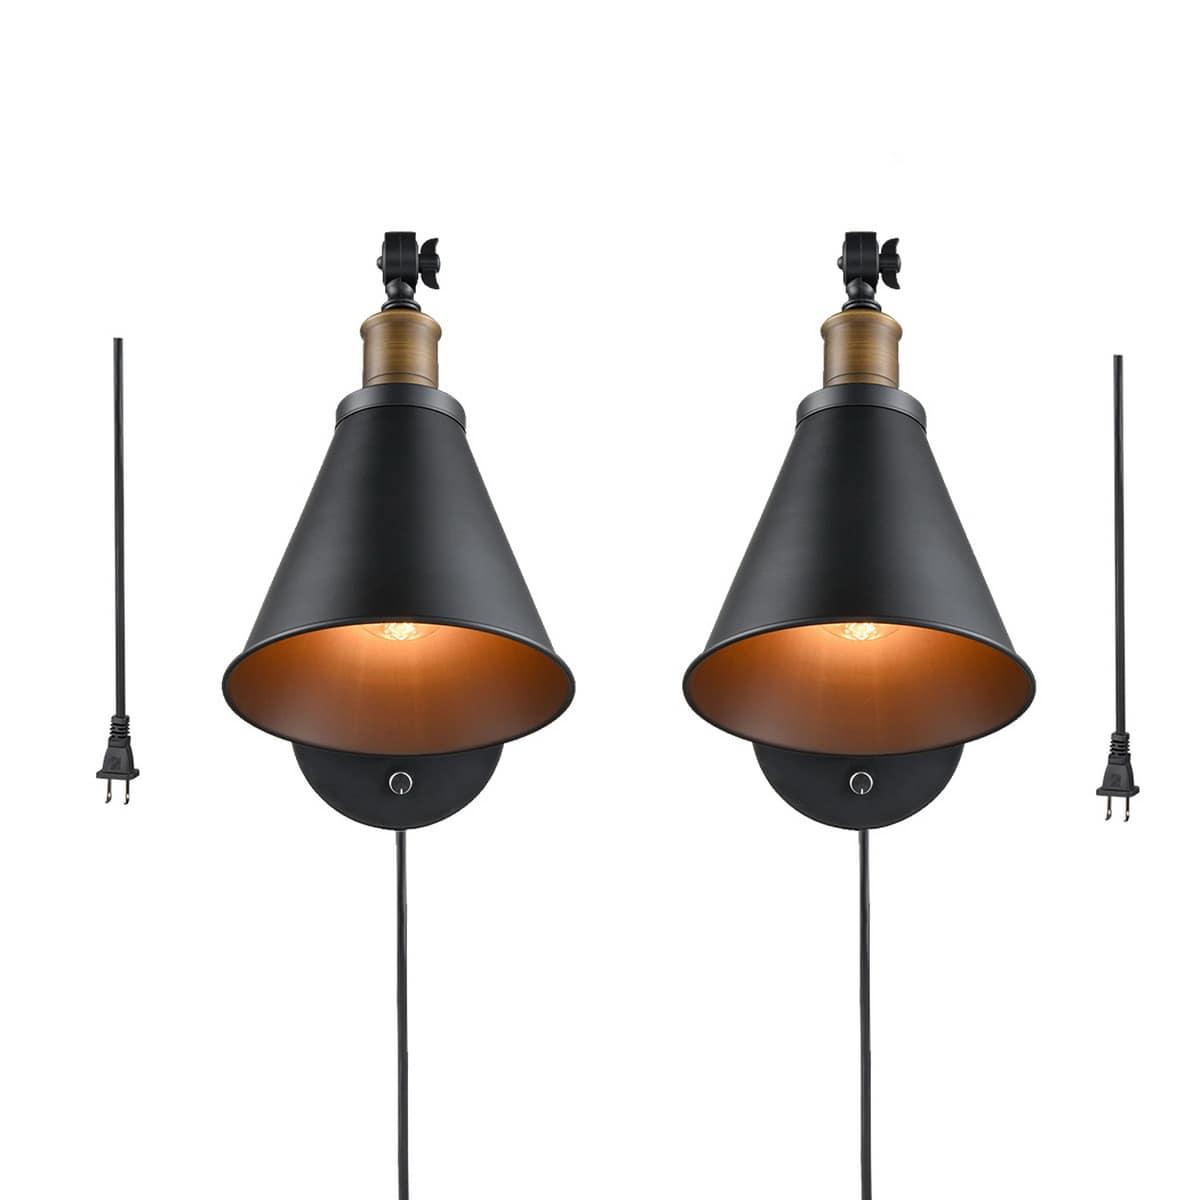 Industrial Black Plug-in Wall Lights Set of 2 Swing Arm Lamps